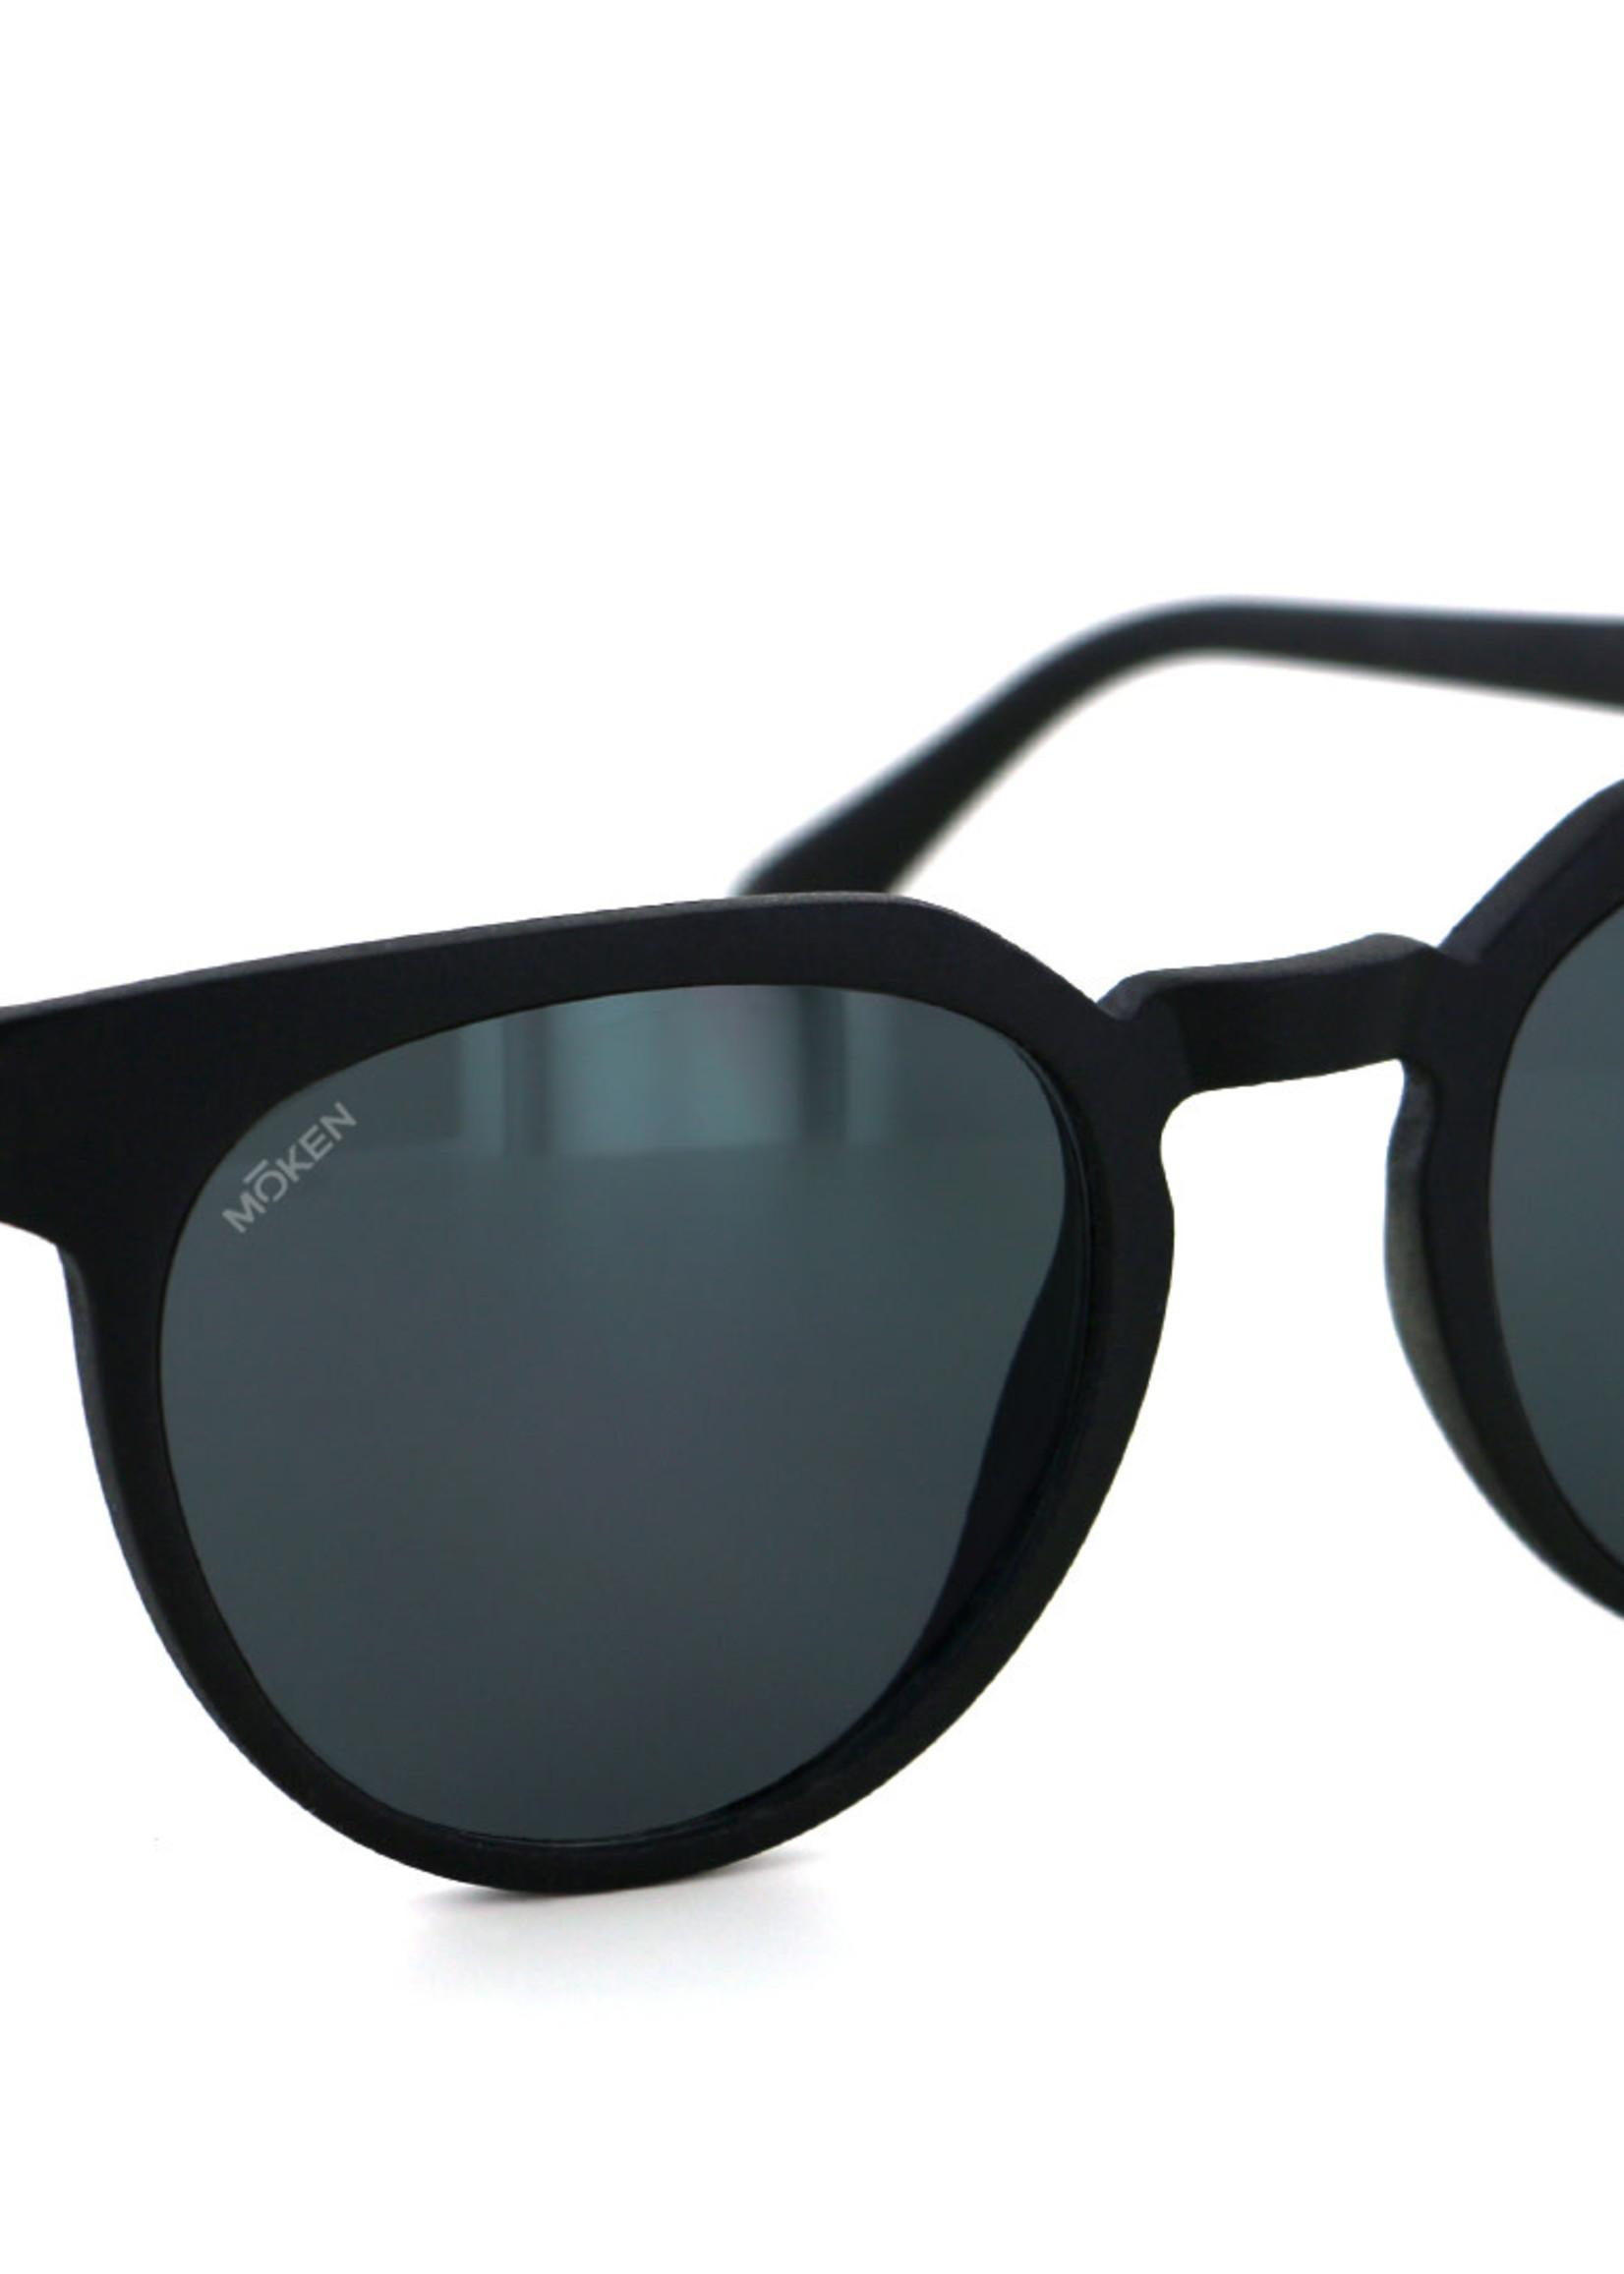 Mōken Bake Black Sunglasses